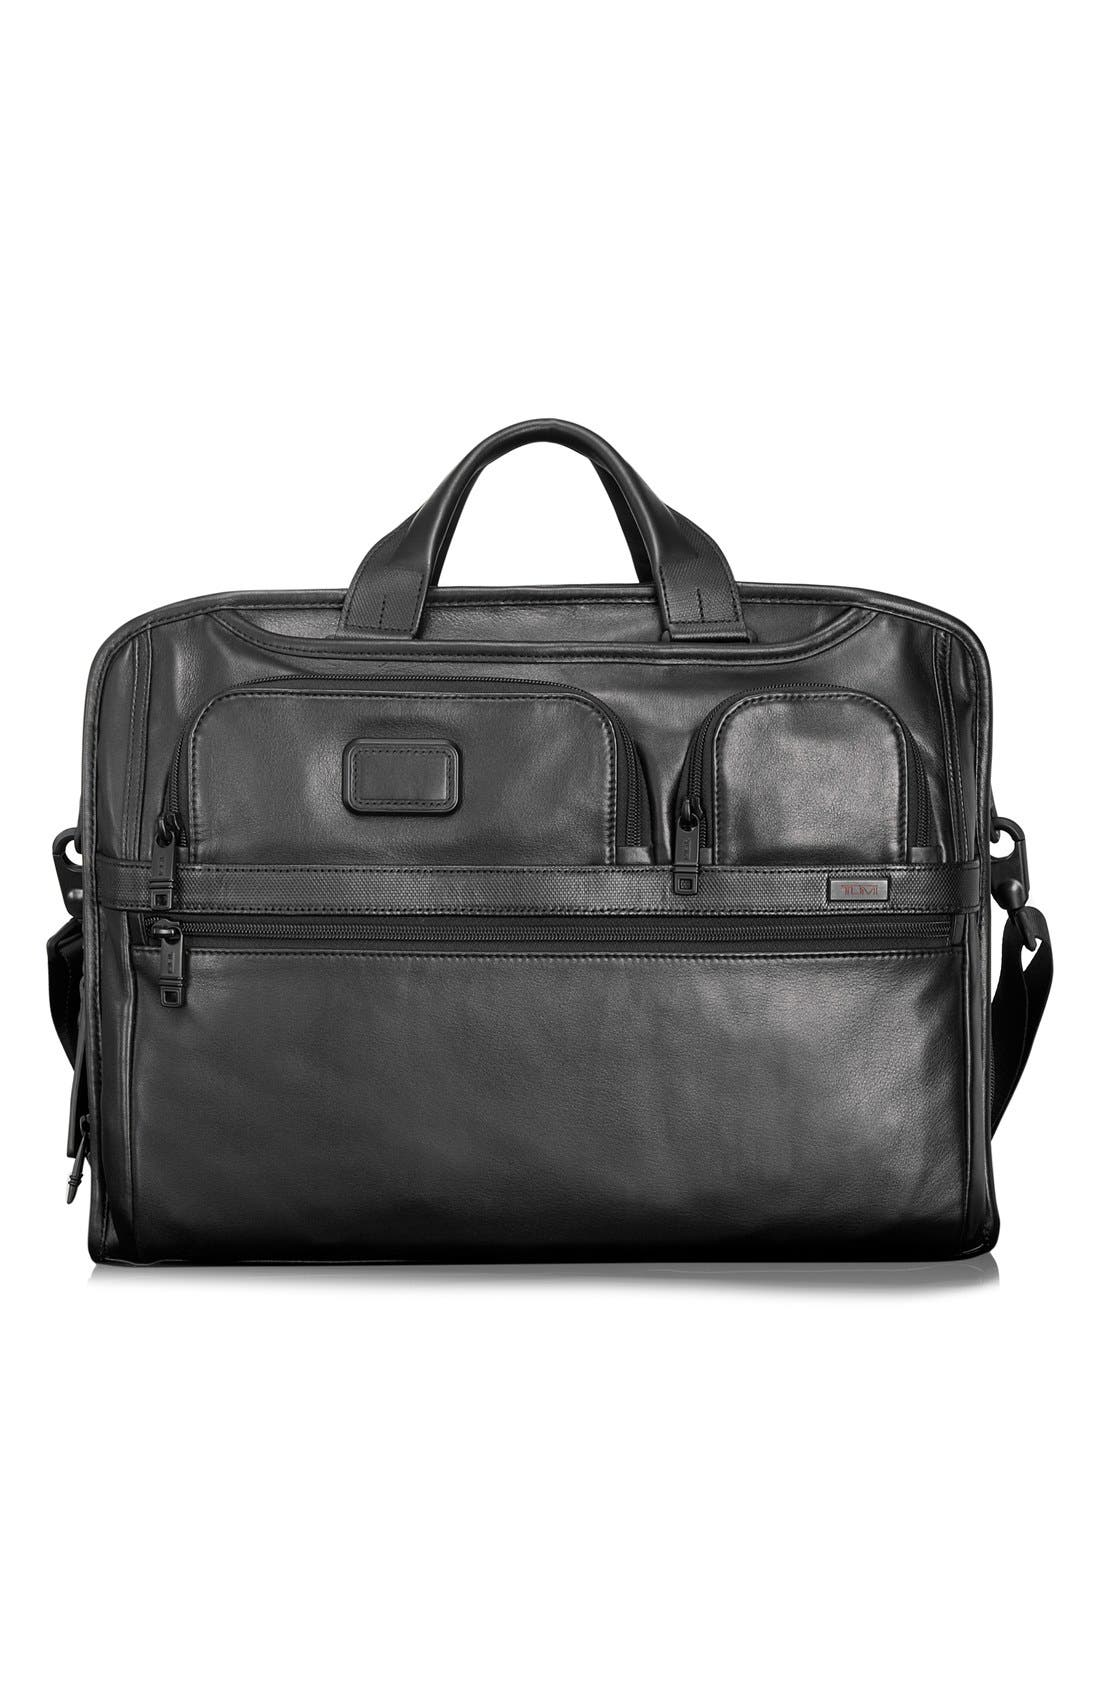 TUMI Alpha 2 Softside Leather Laptop Briefcase